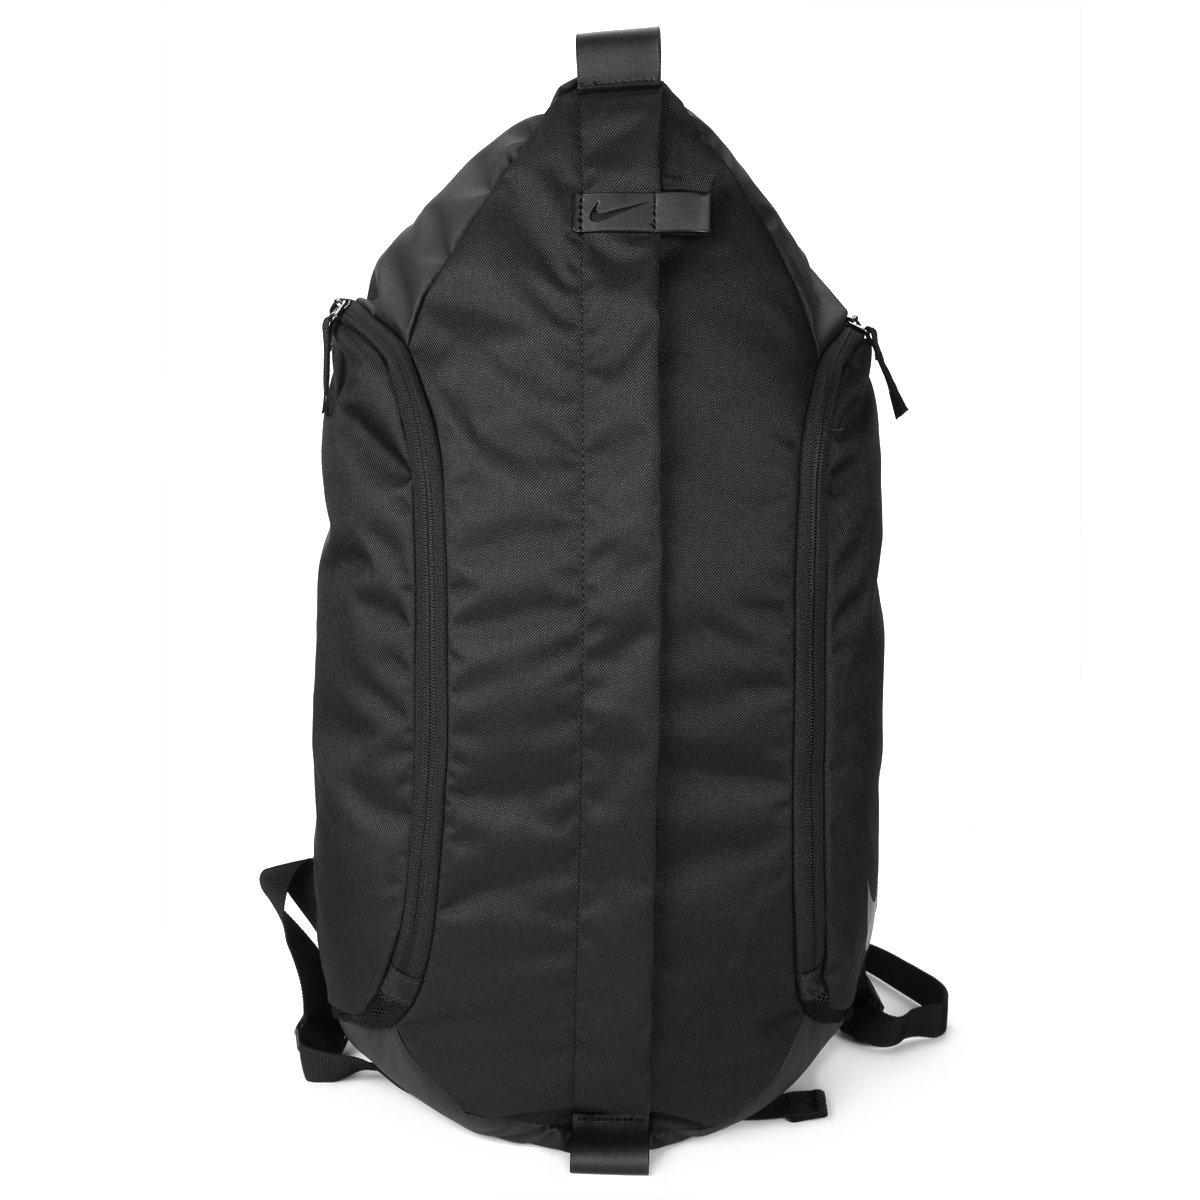 756ce275e3 Mochila Nike FB - Preto - Compre Agora